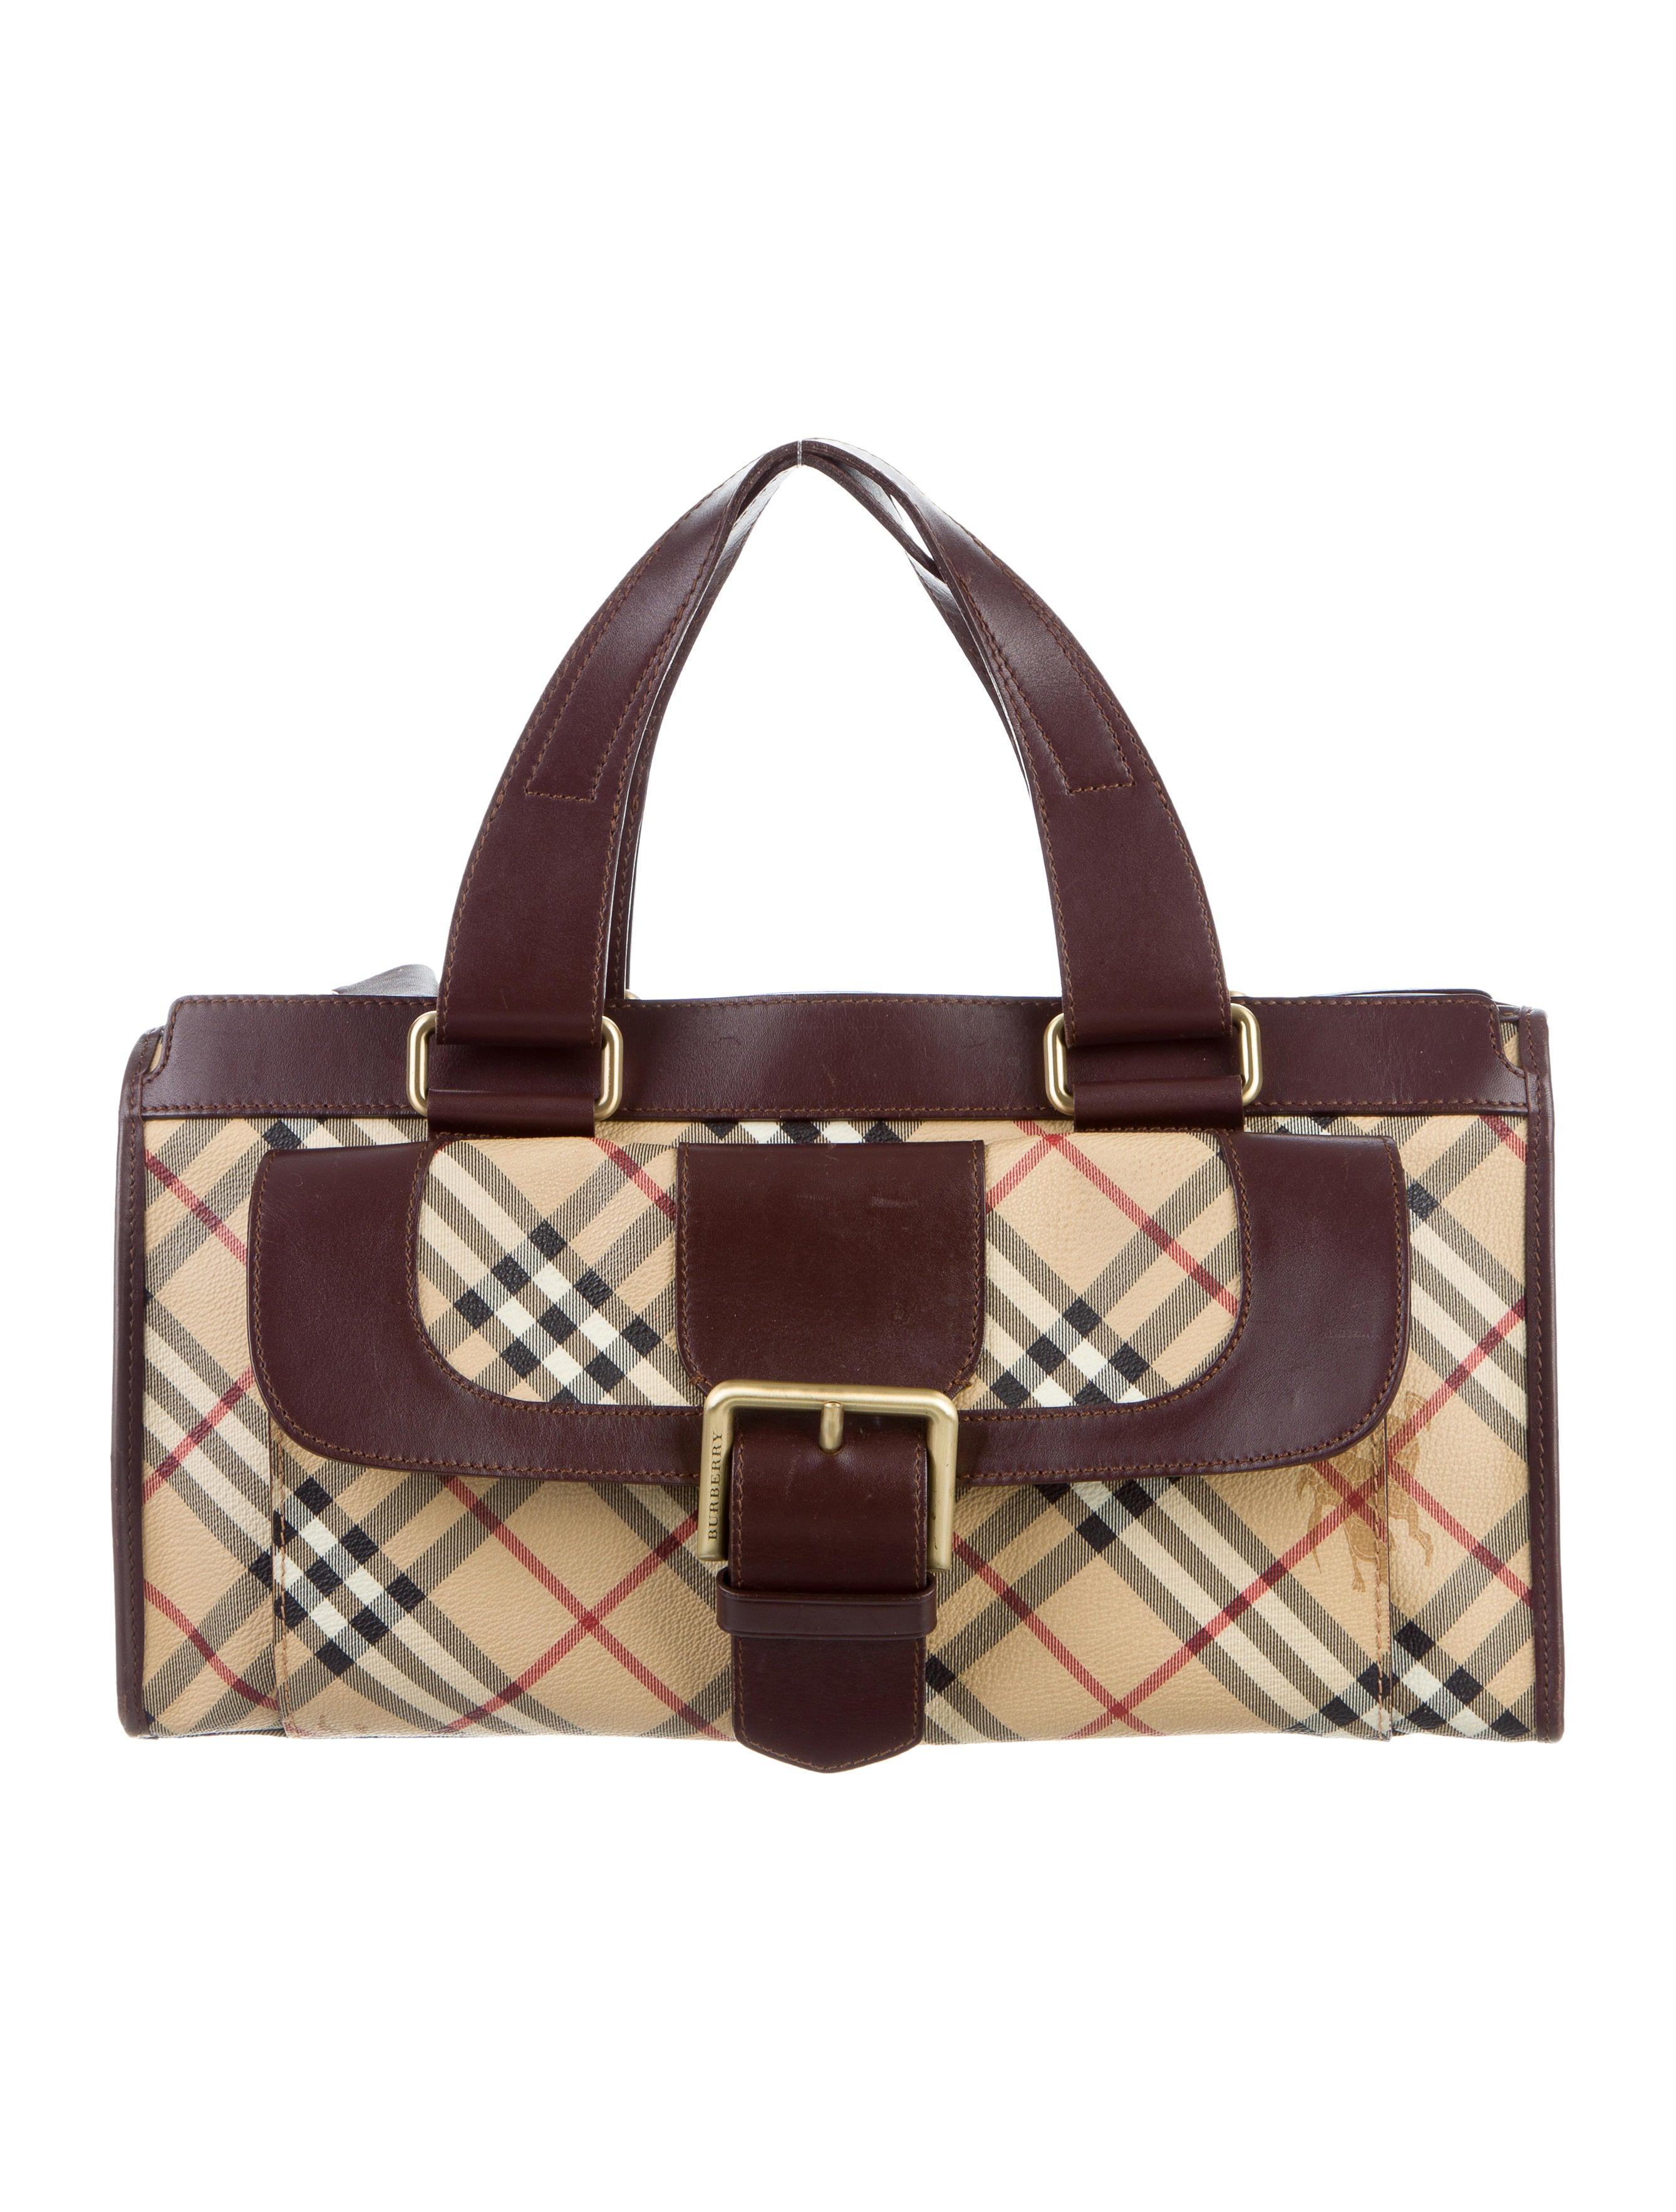 Burberry Leather Trimmed Haymarket Check Bag Handbags